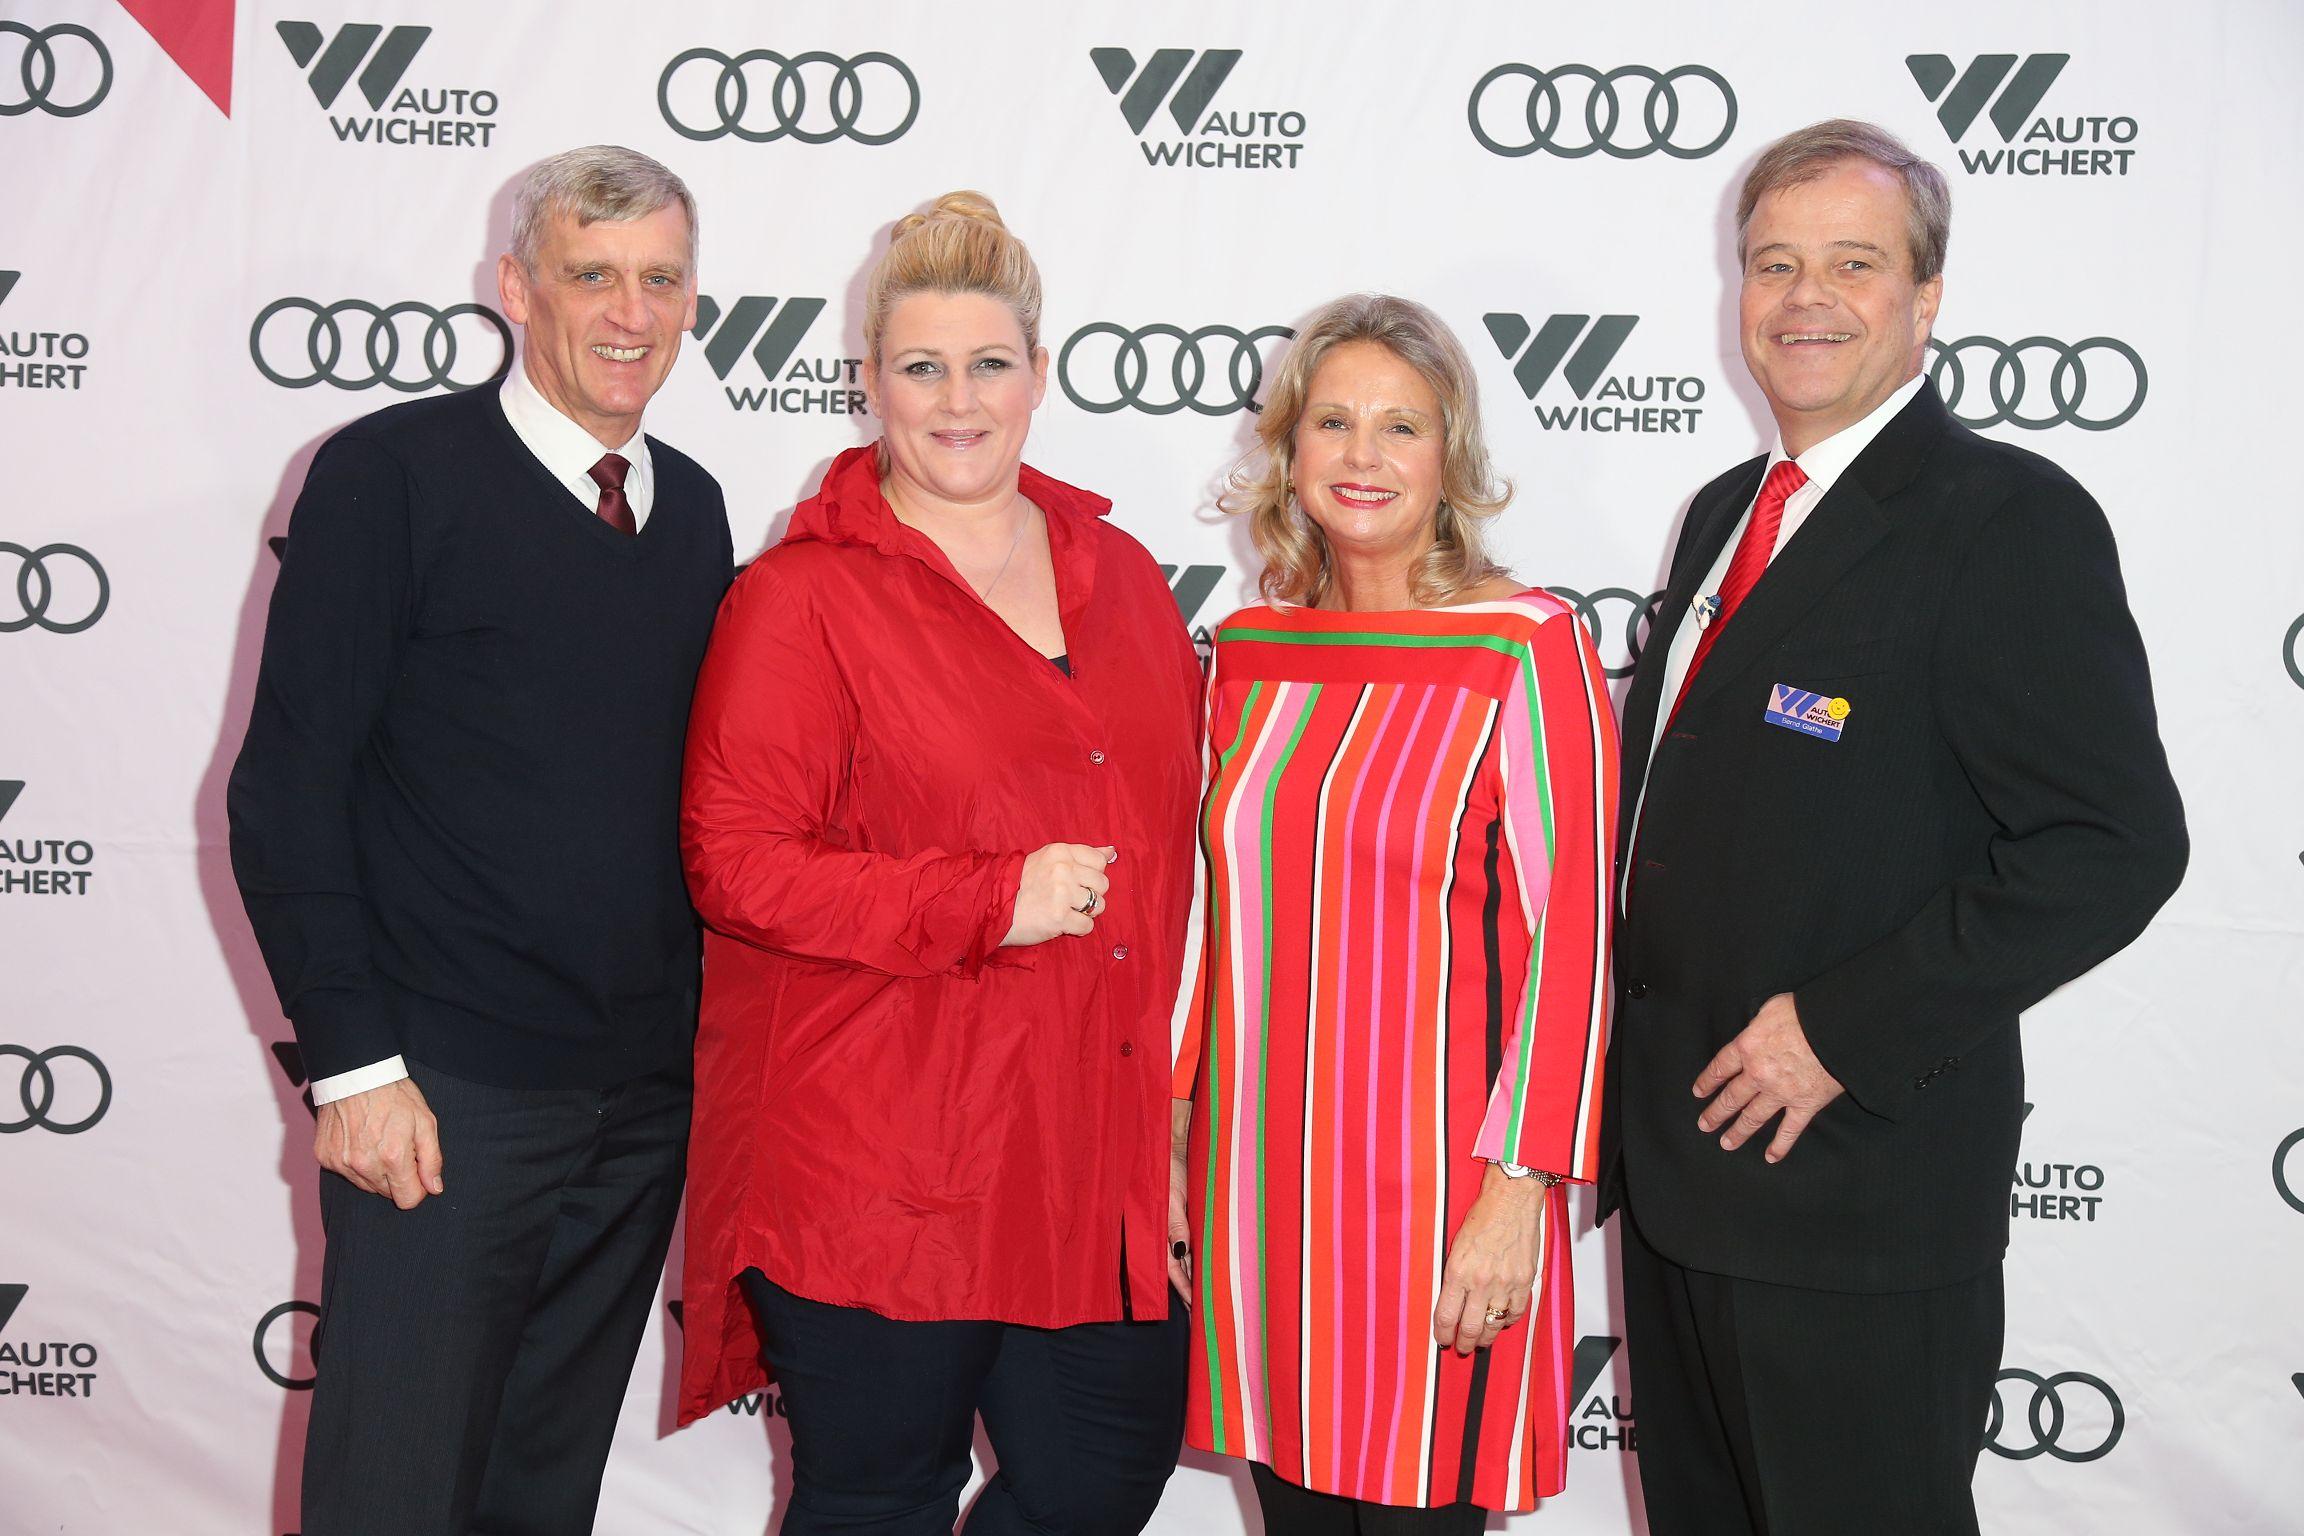 AW-Audi terminal Eröffnung 19.11._HSV Profi Jan Gyamerah und Audi AG Verteibschef Christian Bauer